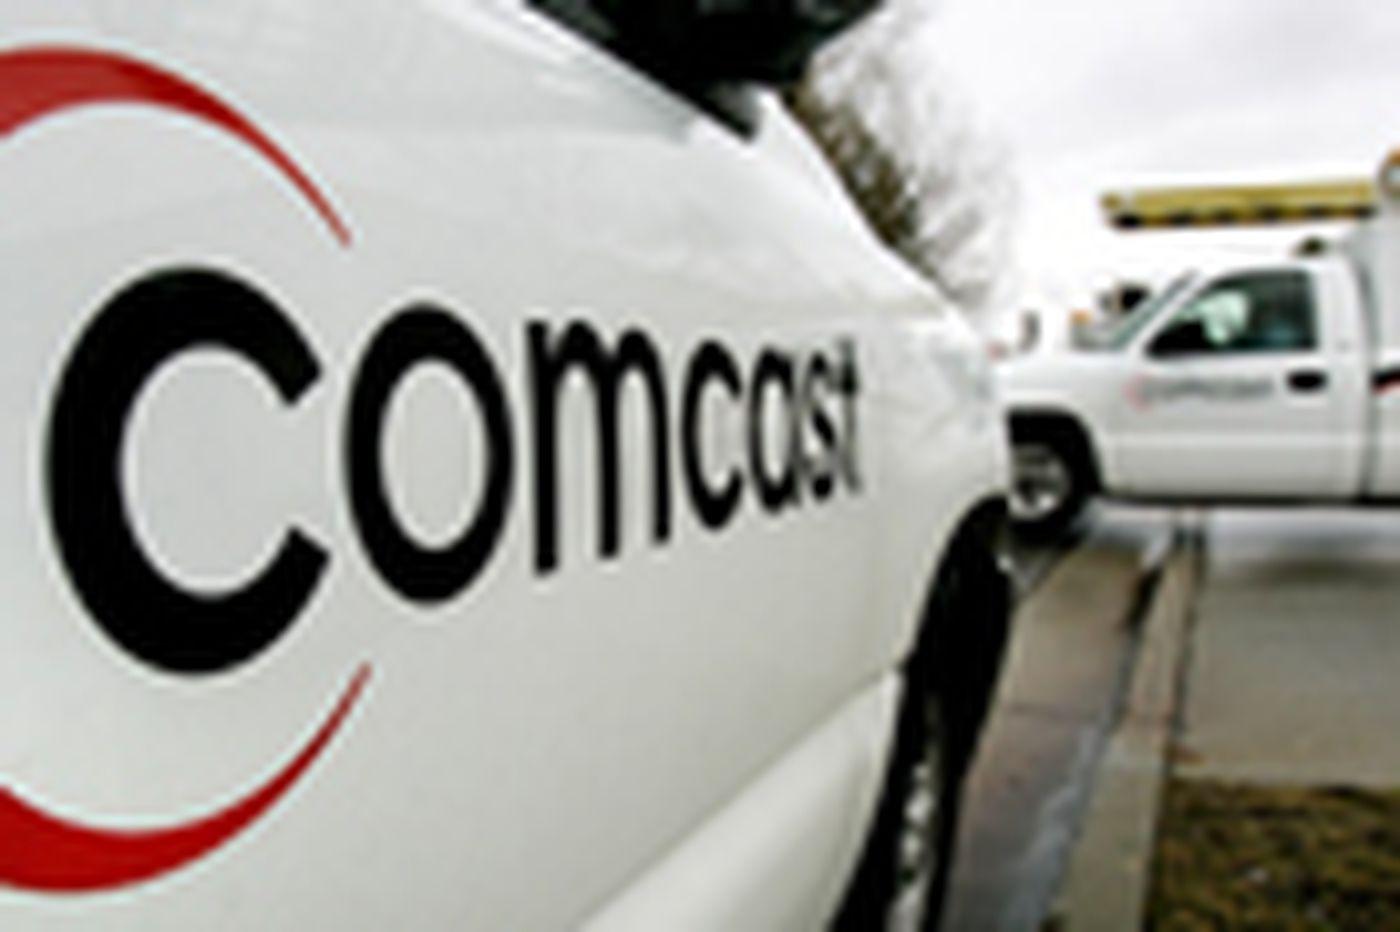 Verizon Wireless buying wireless unit from Comcast group